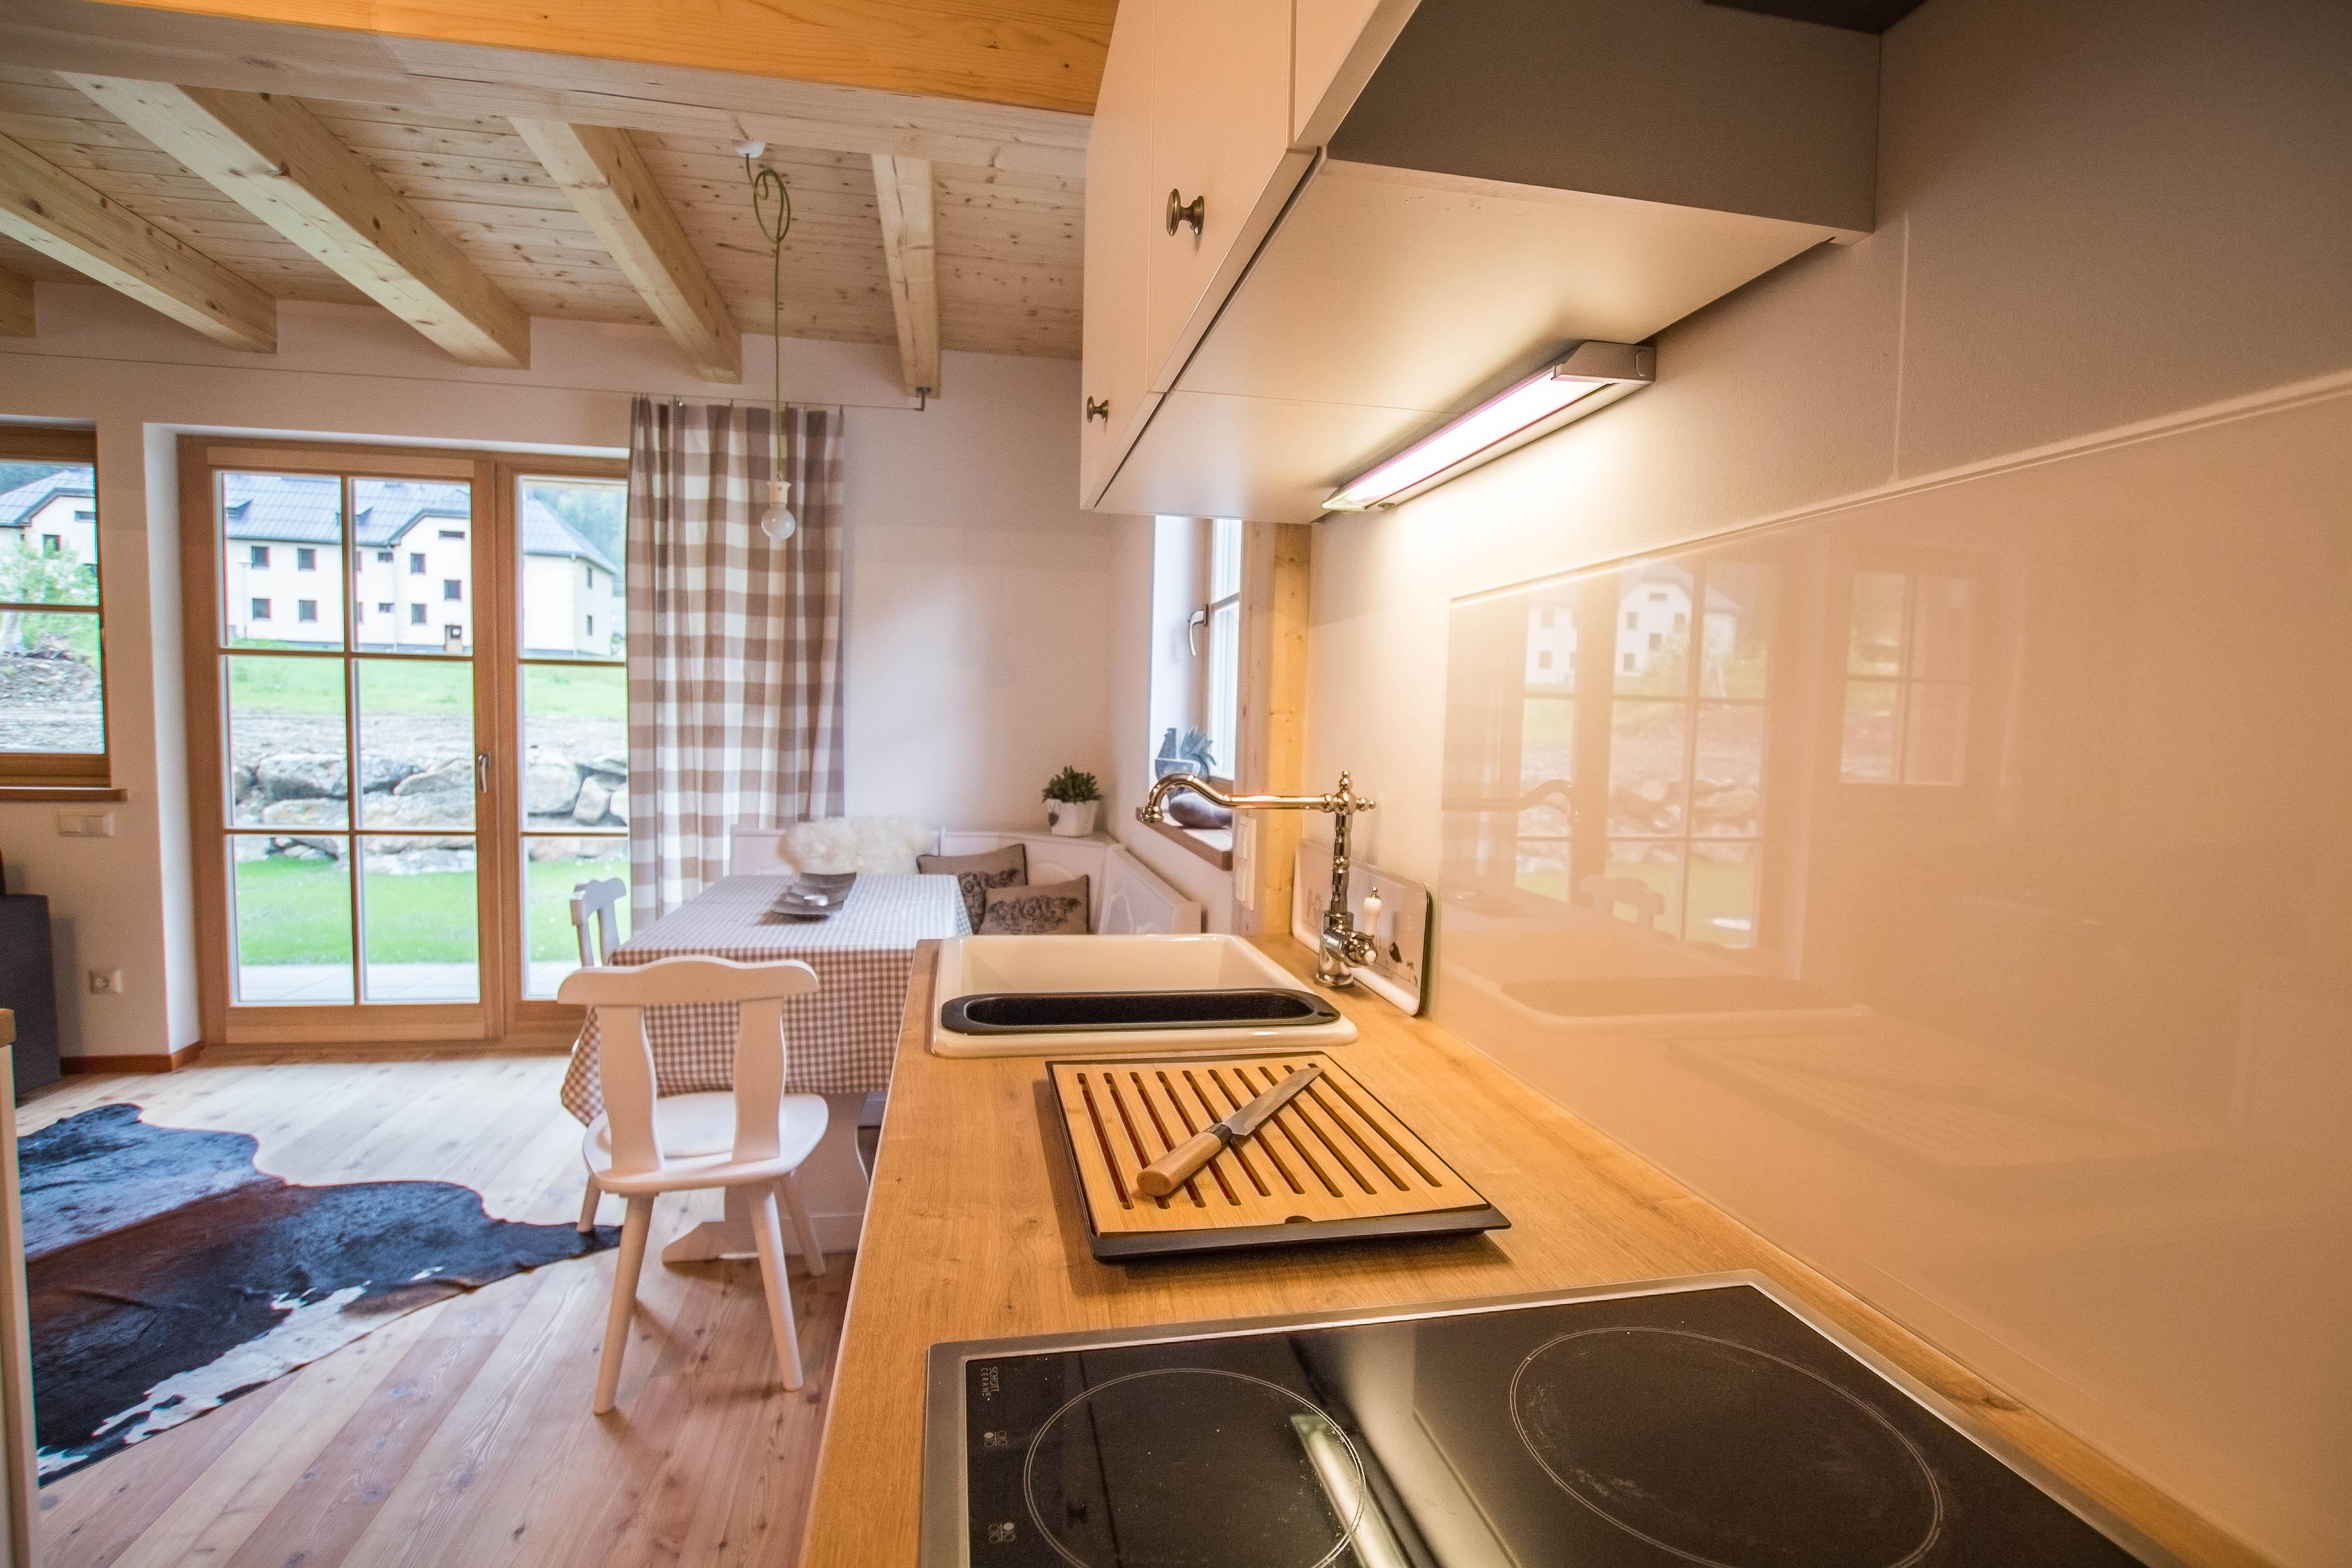 Maison de vacances Lodge Kleiner Bär direkt am Skilift (2050394), Uttendorf, Pinzgau, Salzbourg, Autriche, image 2